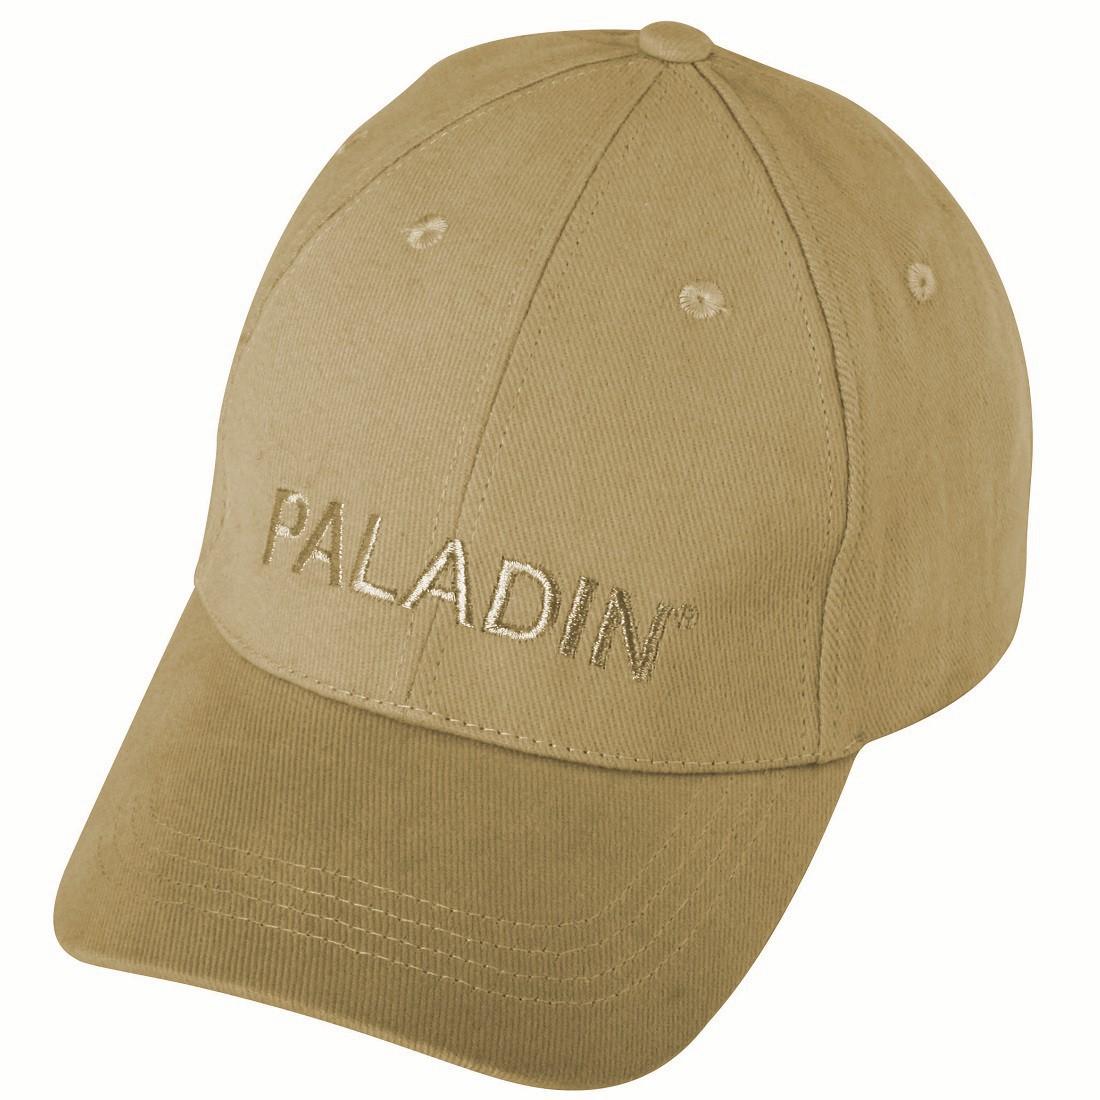 Paladin Kappe oder Basecap - khaki